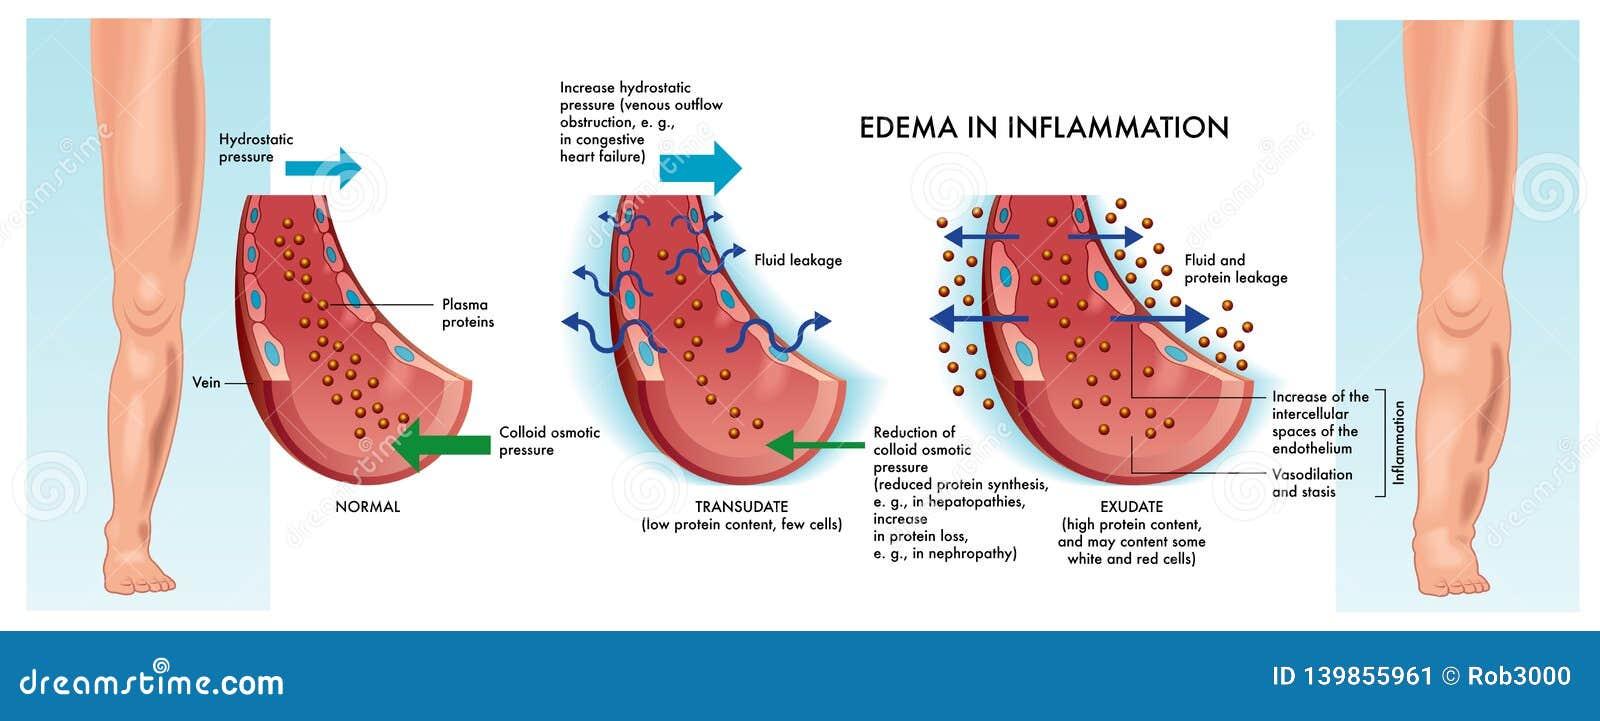 Edema Medical Illustration Stock Vector  Illustration Of Diagram